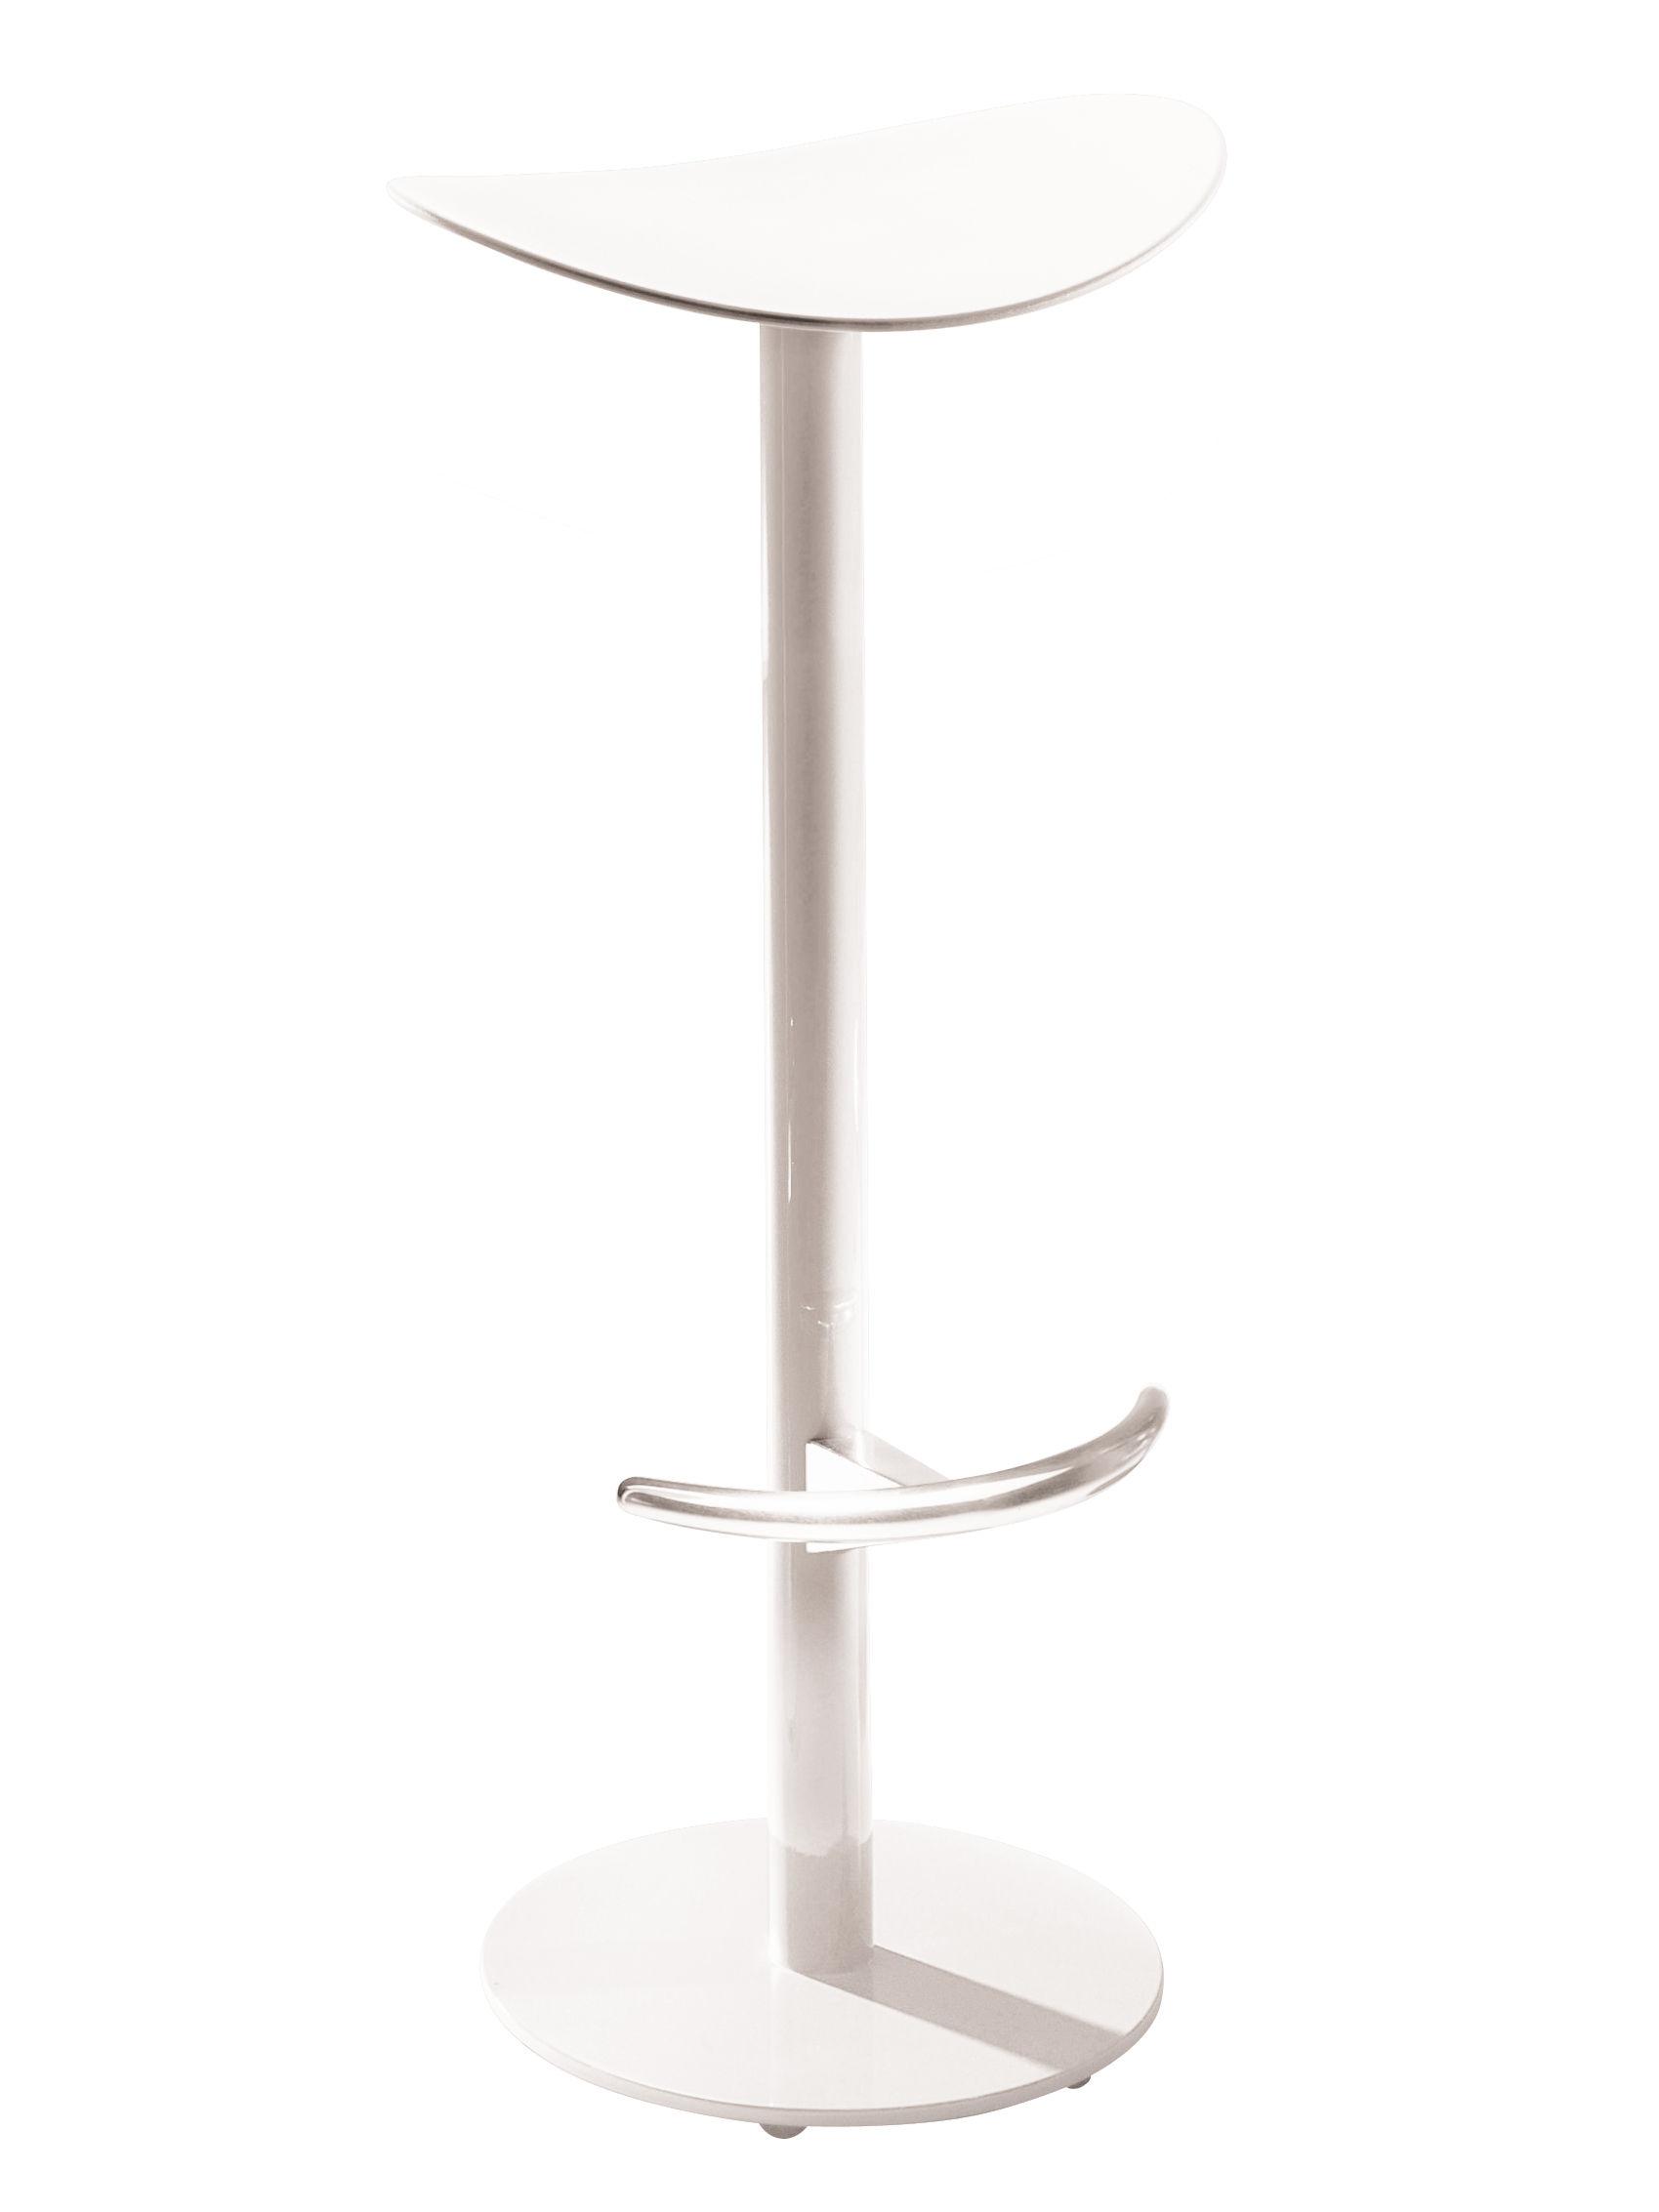 Arredamento - Sgabelli da bar  - Sgabello bar Coma - h 79 cm di Enea - Bianco - Acciaio laccato, Polipropilene